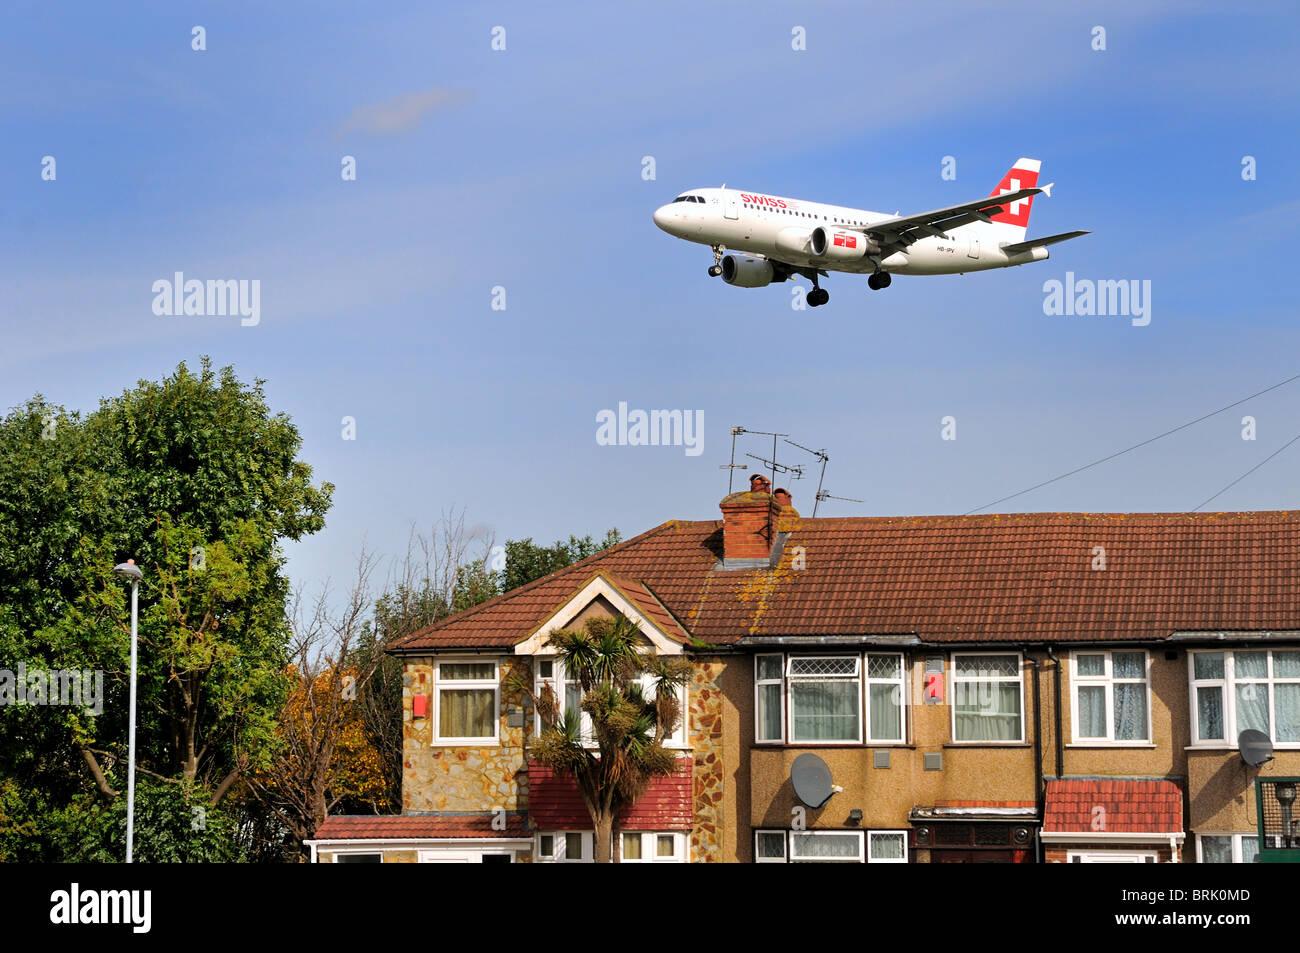 Low flying passenger aircraft landing at Heathrow  airport, London - Stock Image